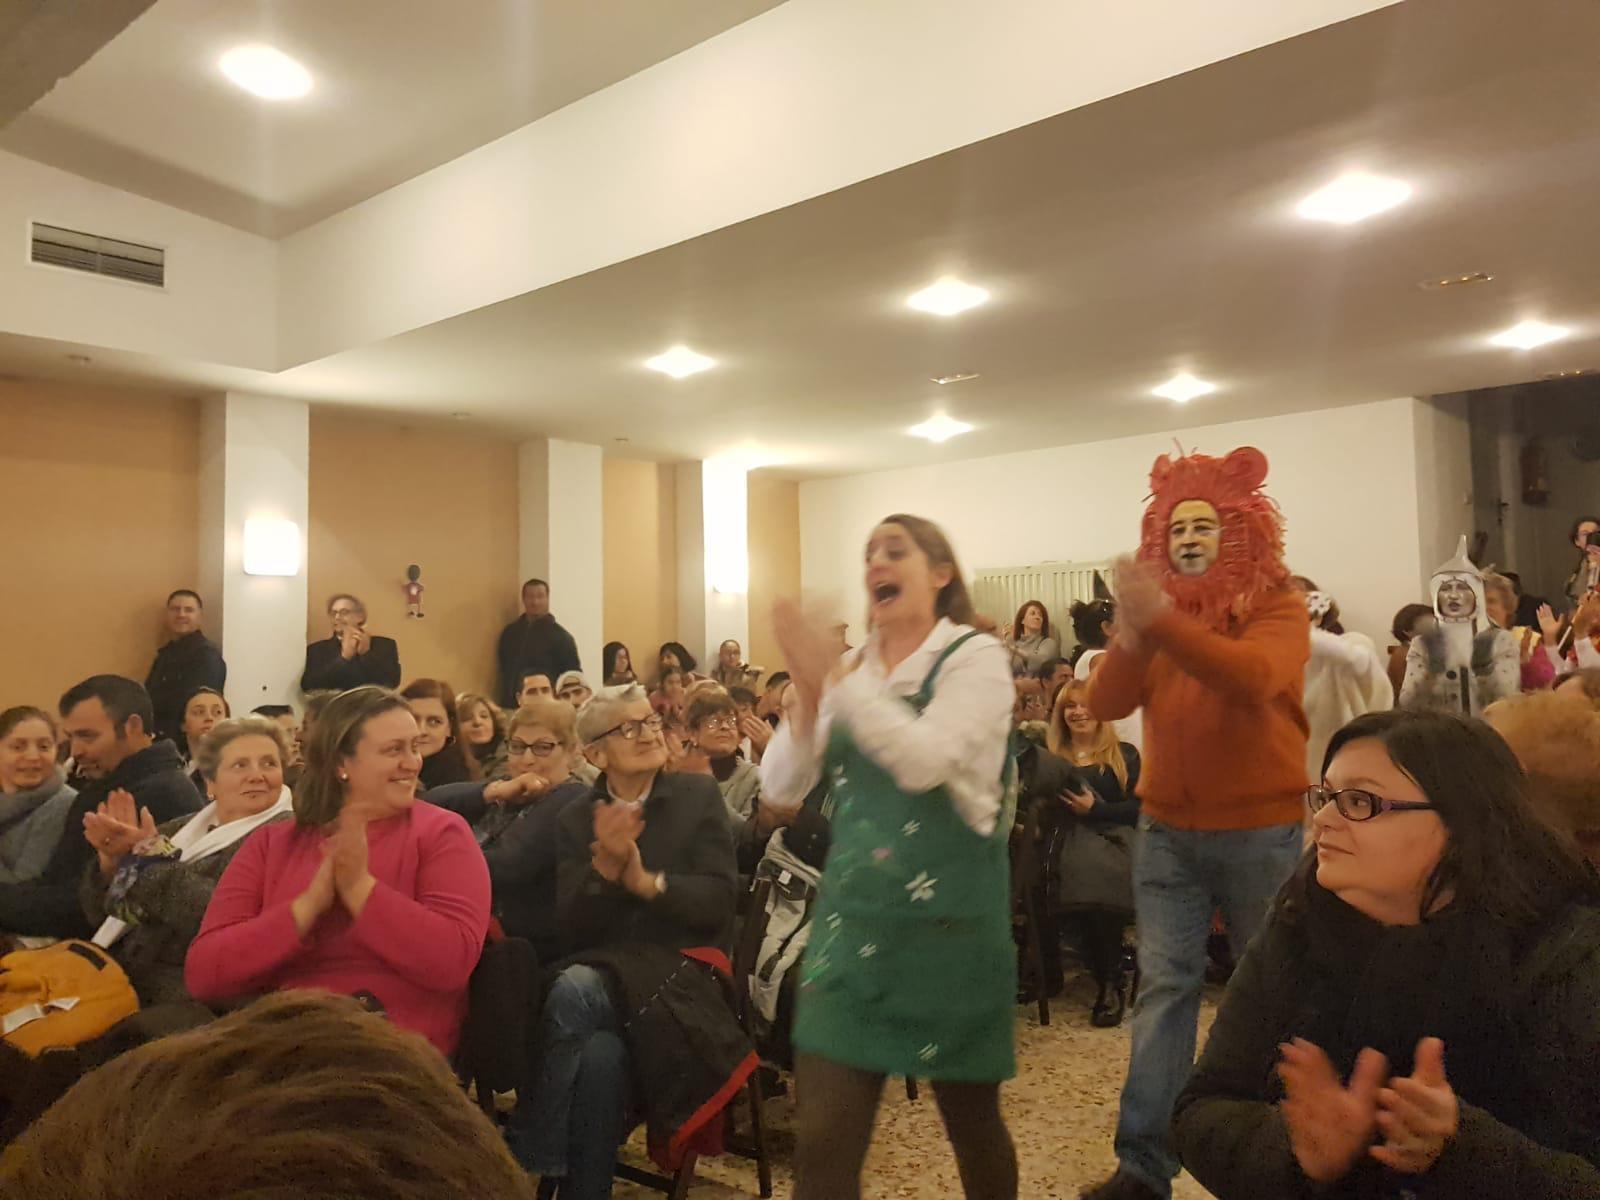 teatro-sange-mago-de-oz-2019-reyes-magos-2